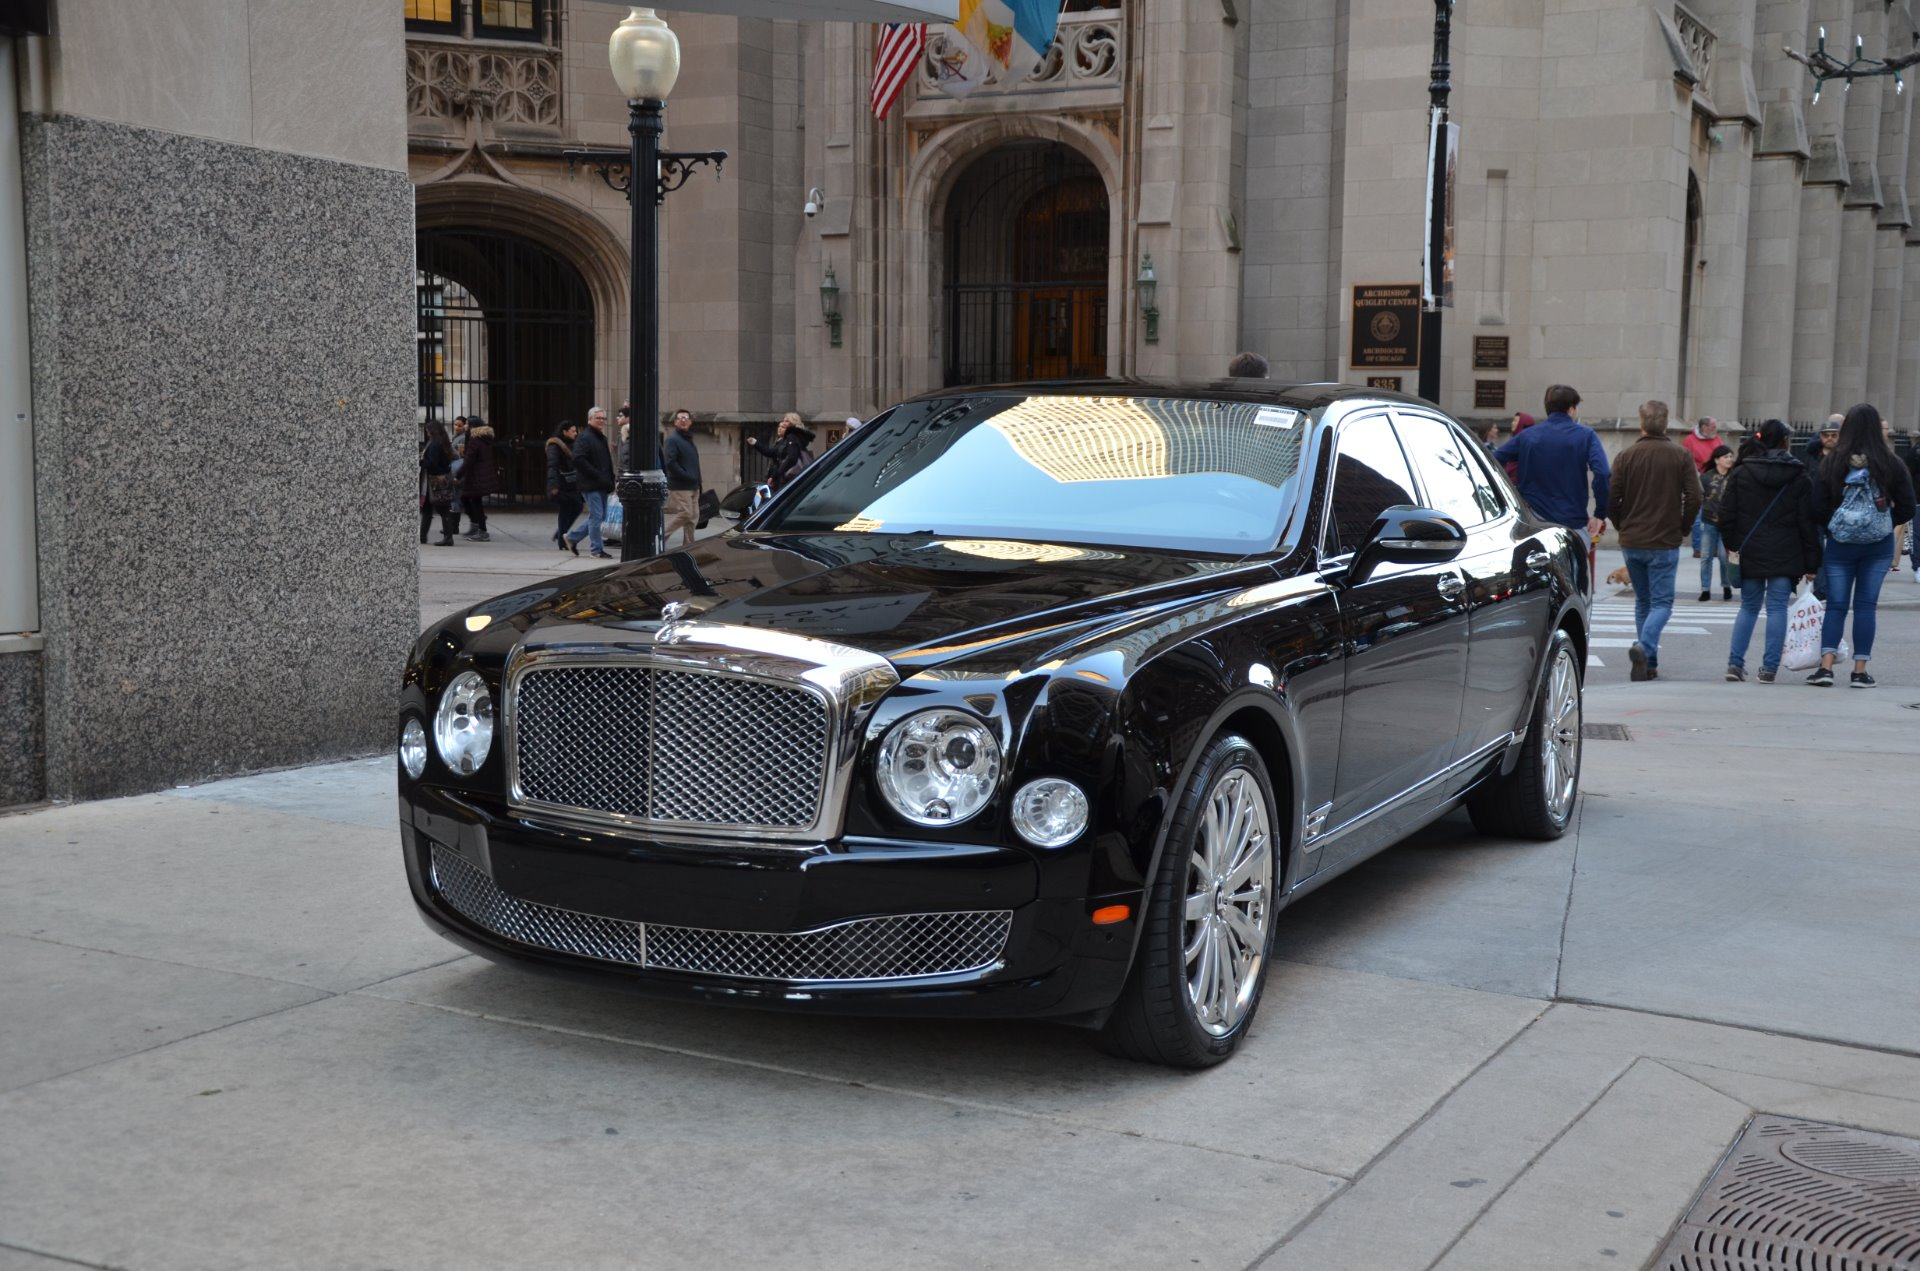 2014 Bentley Mulsanne Stock GC2214 S for sale near Chicago IL